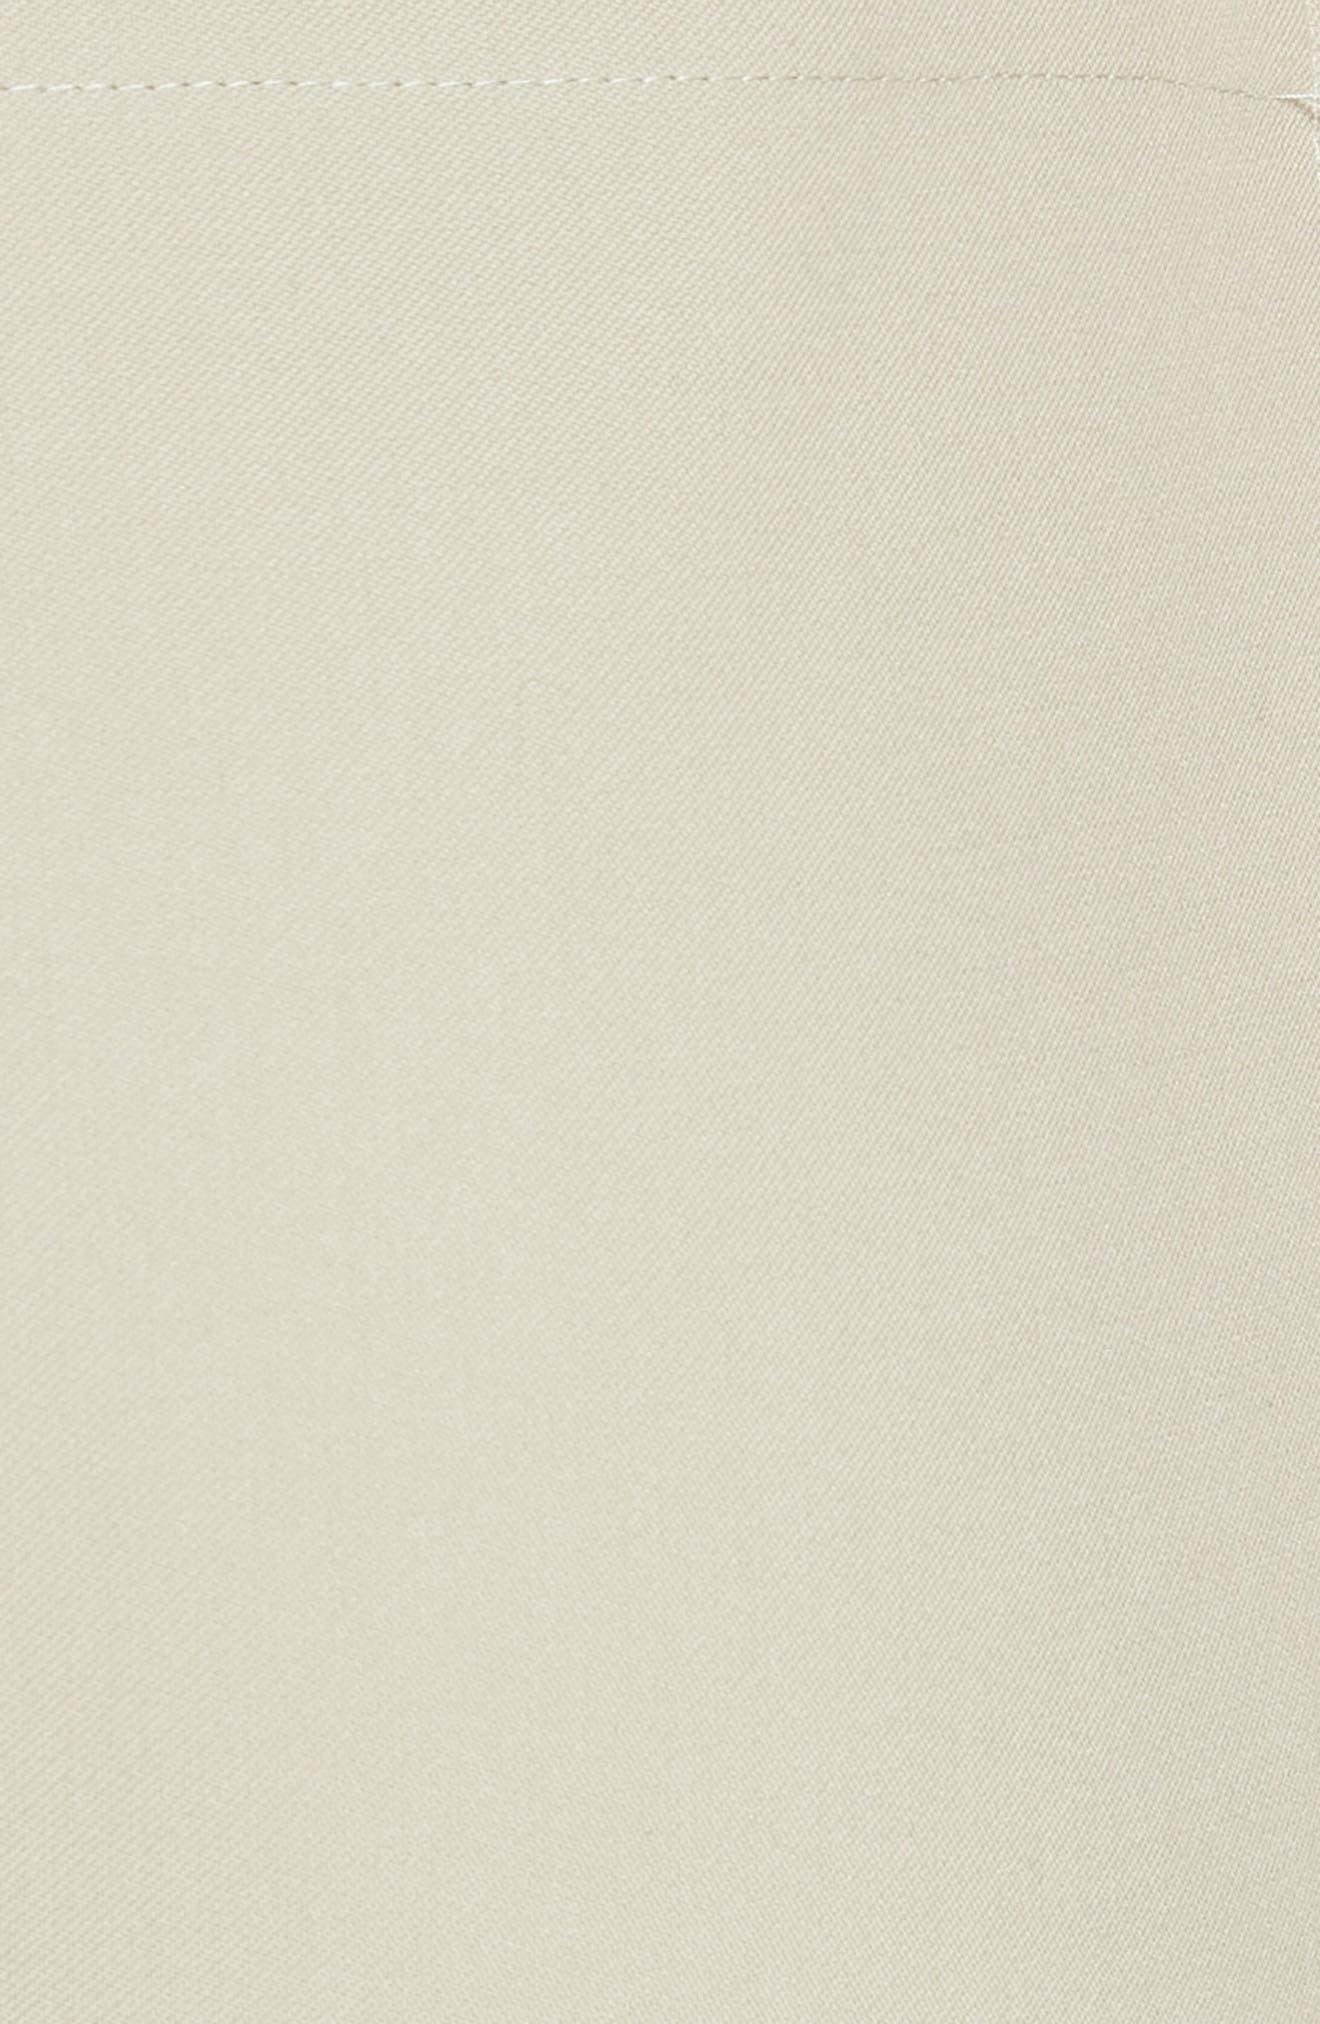 TIBI,                             Margaux Miniskirt,                             Alternate thumbnail 5, color,                             310